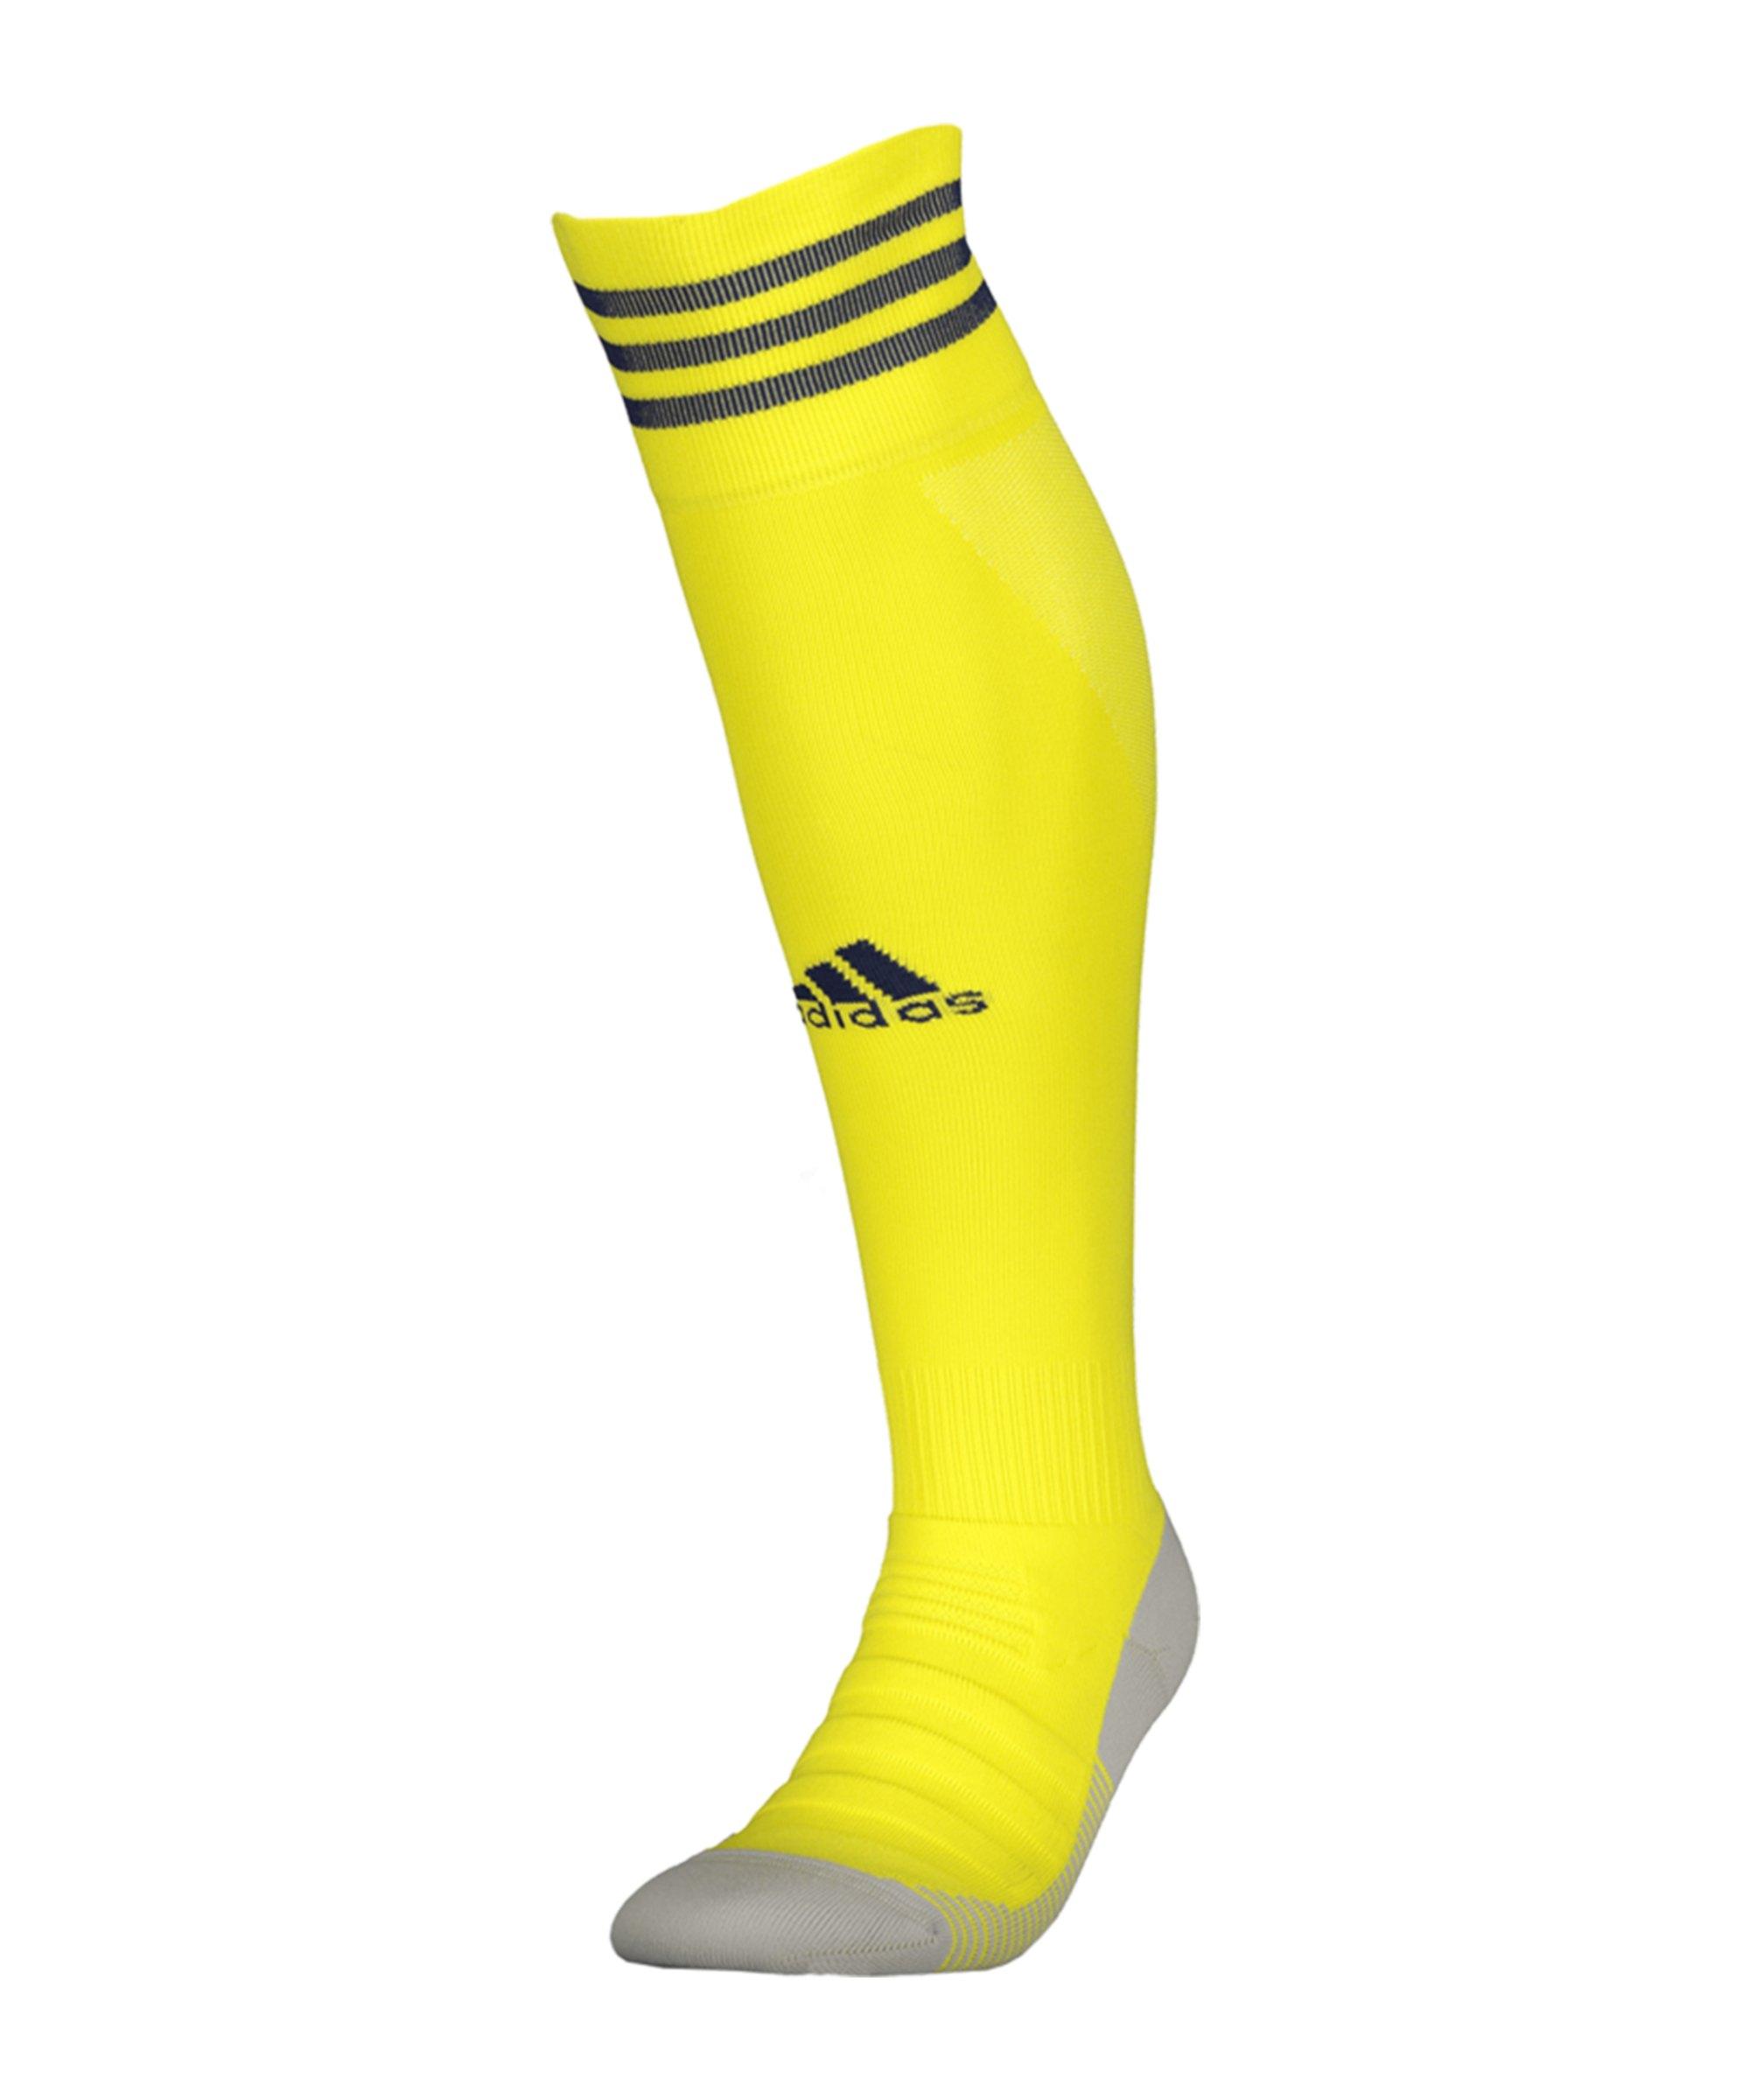 adidas AdiSock 18 Stutzenstrumpf Gelb Blau - gelb